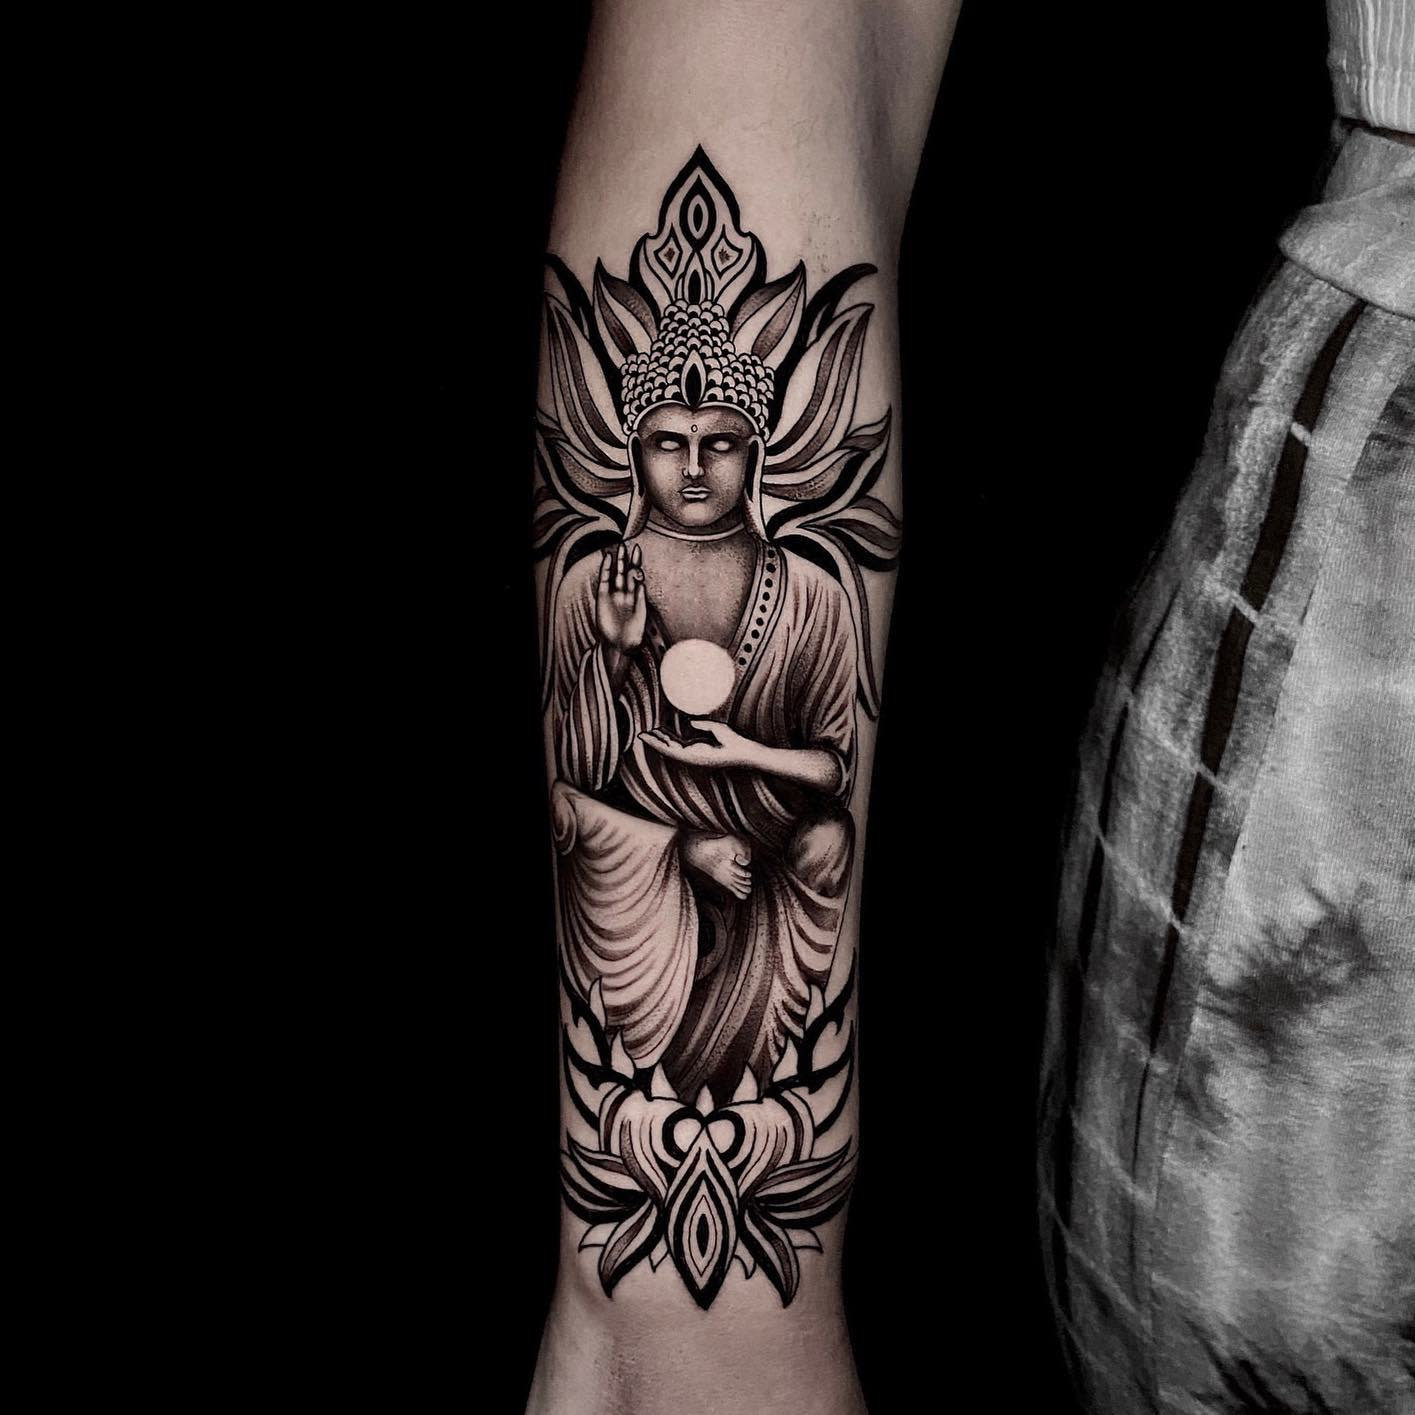 Forearm Buddha Tattoo -noah_hasenei